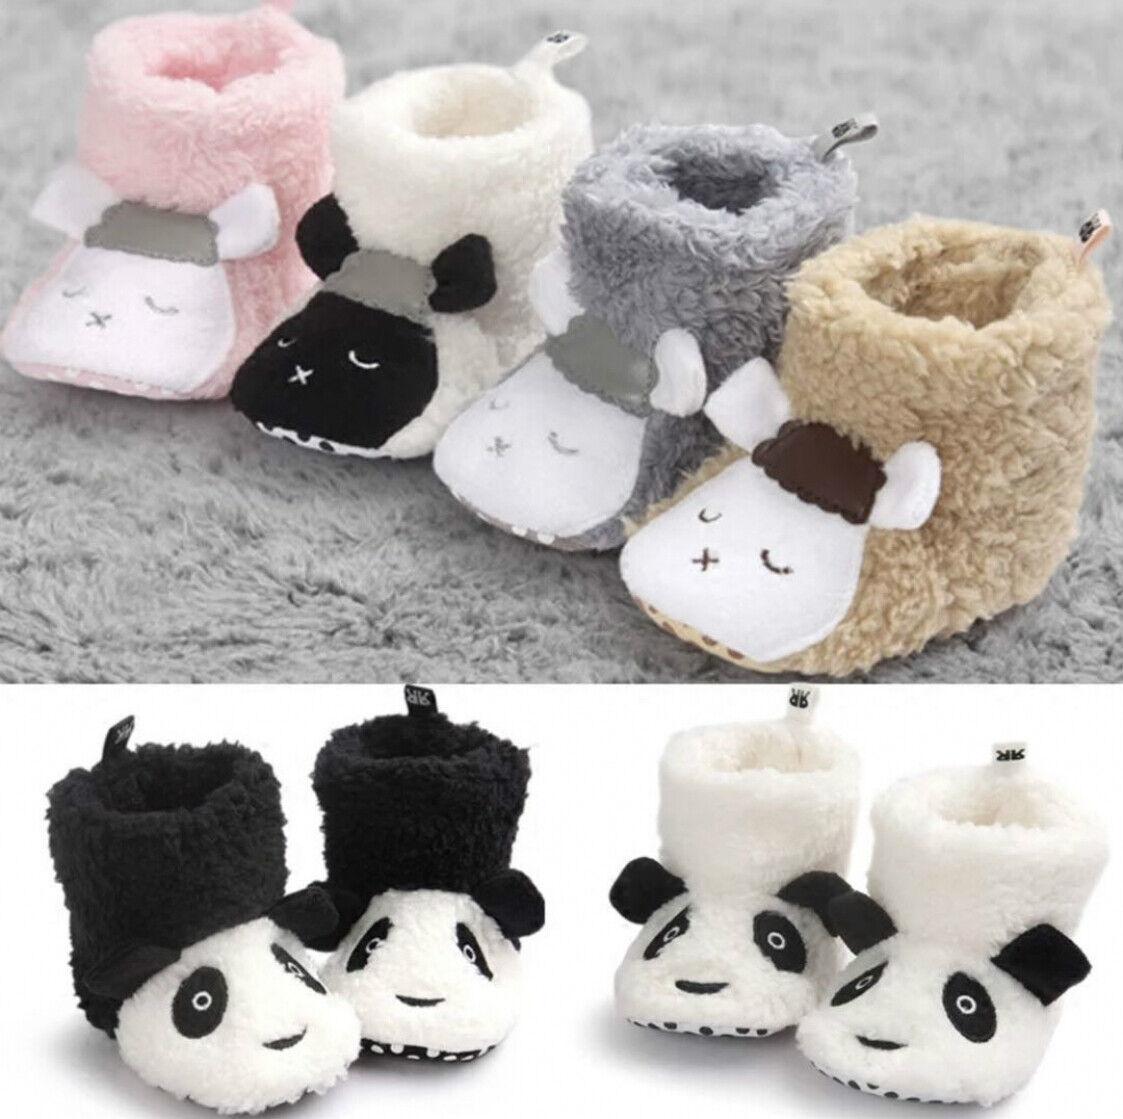 Newborn Baby Soft Sole Crib Shoes Infant Boy Girl Toddler No